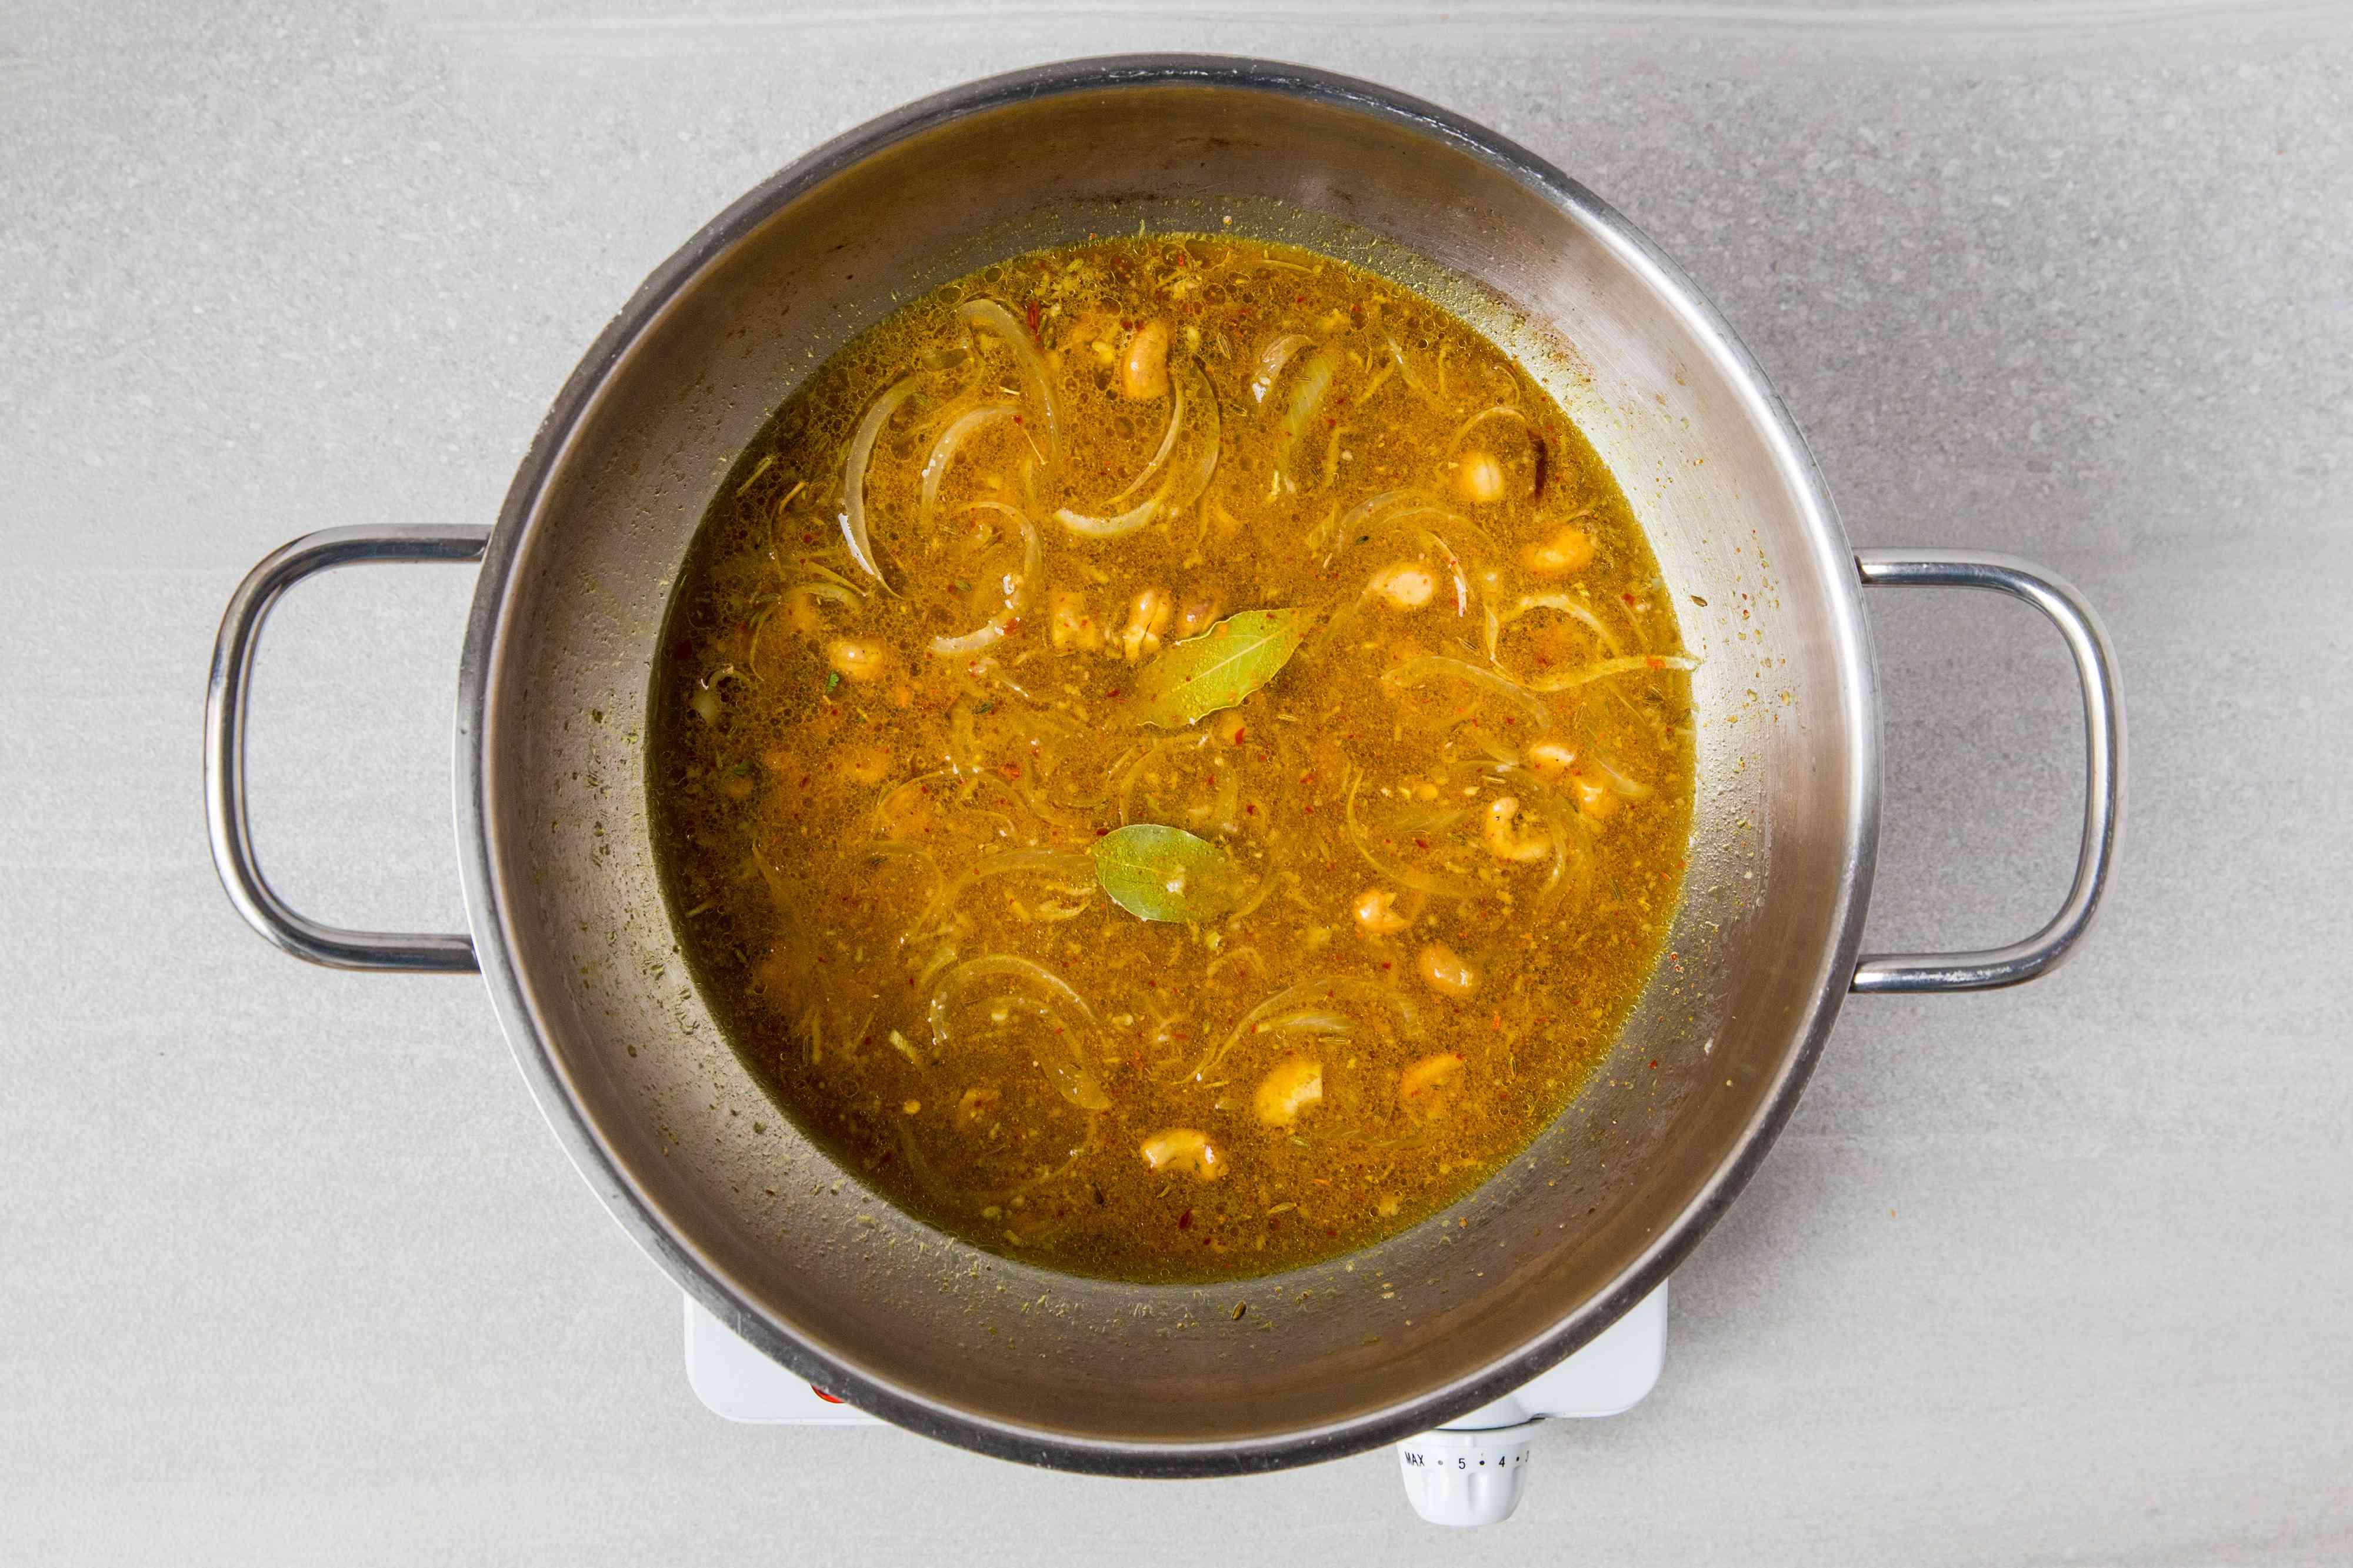 A pot of seasoned broth simmering